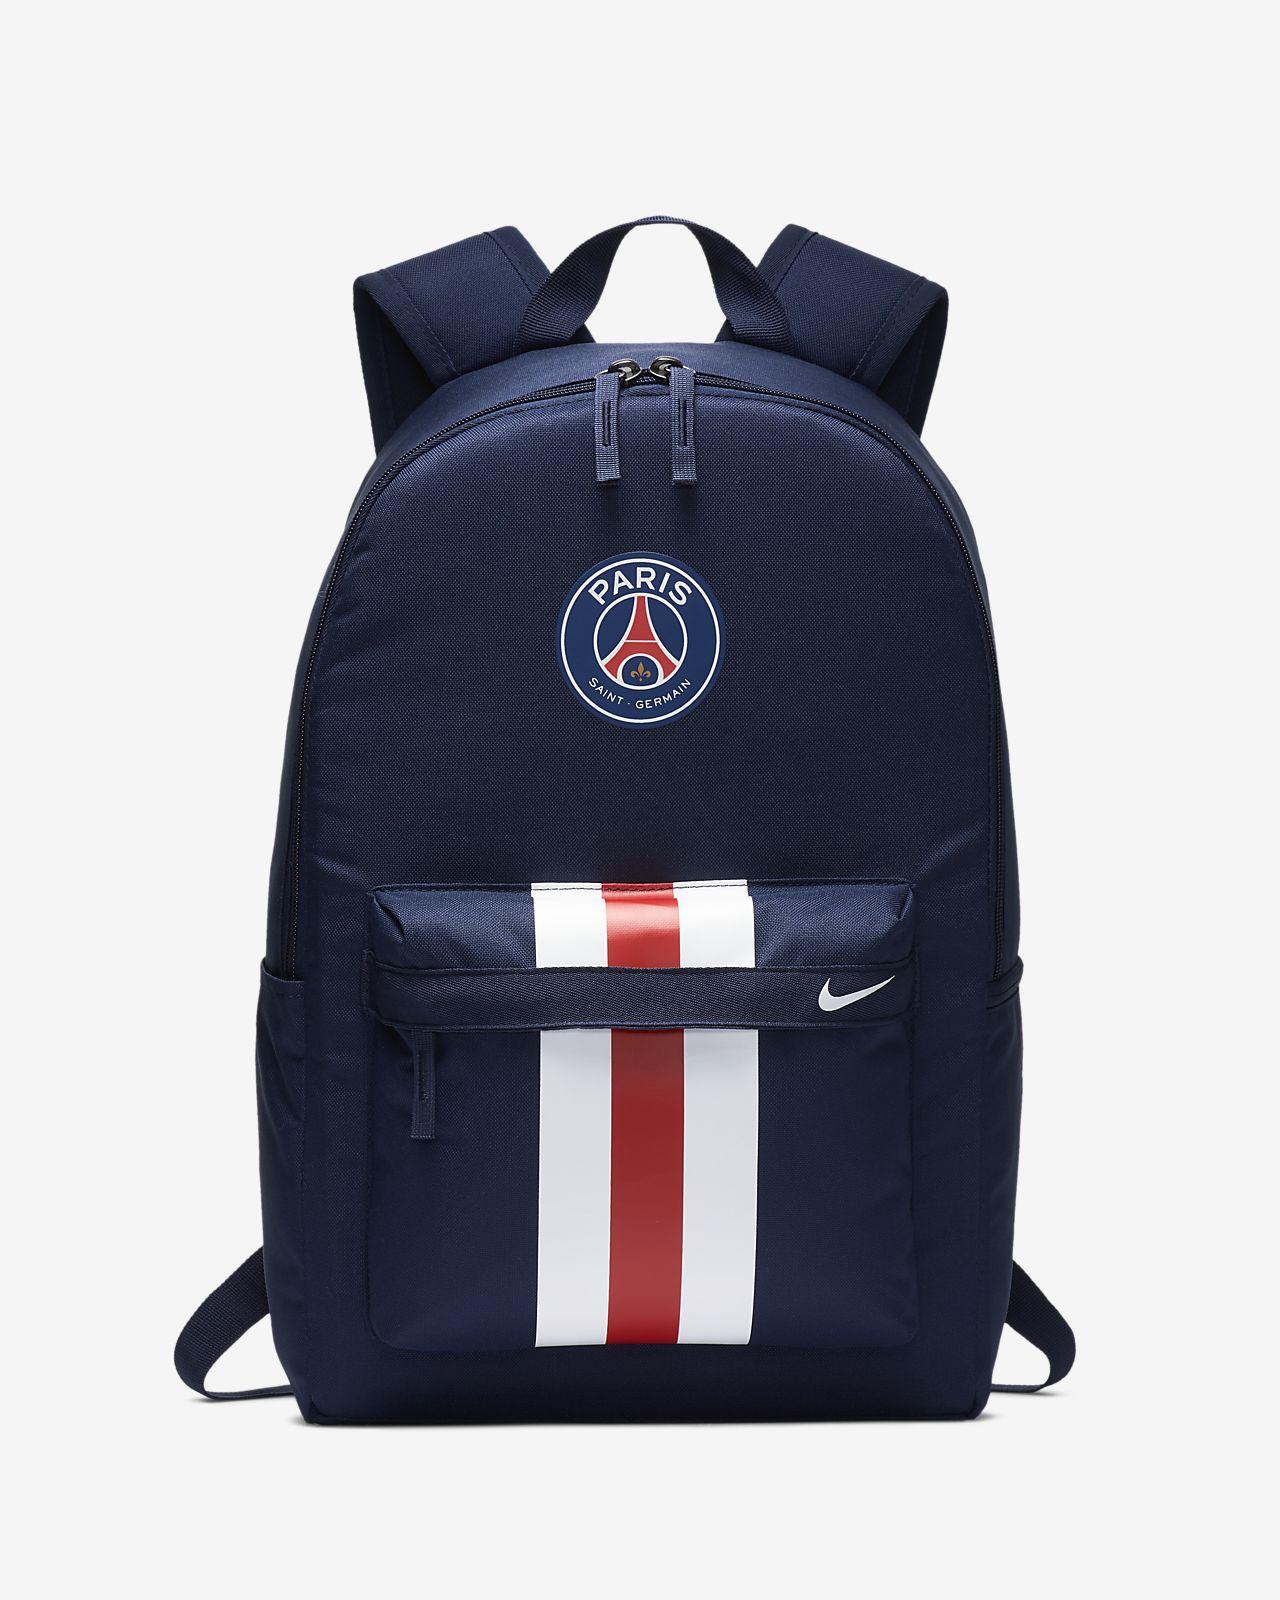 Paris Saint-Germain Stadium Soccer Backpack